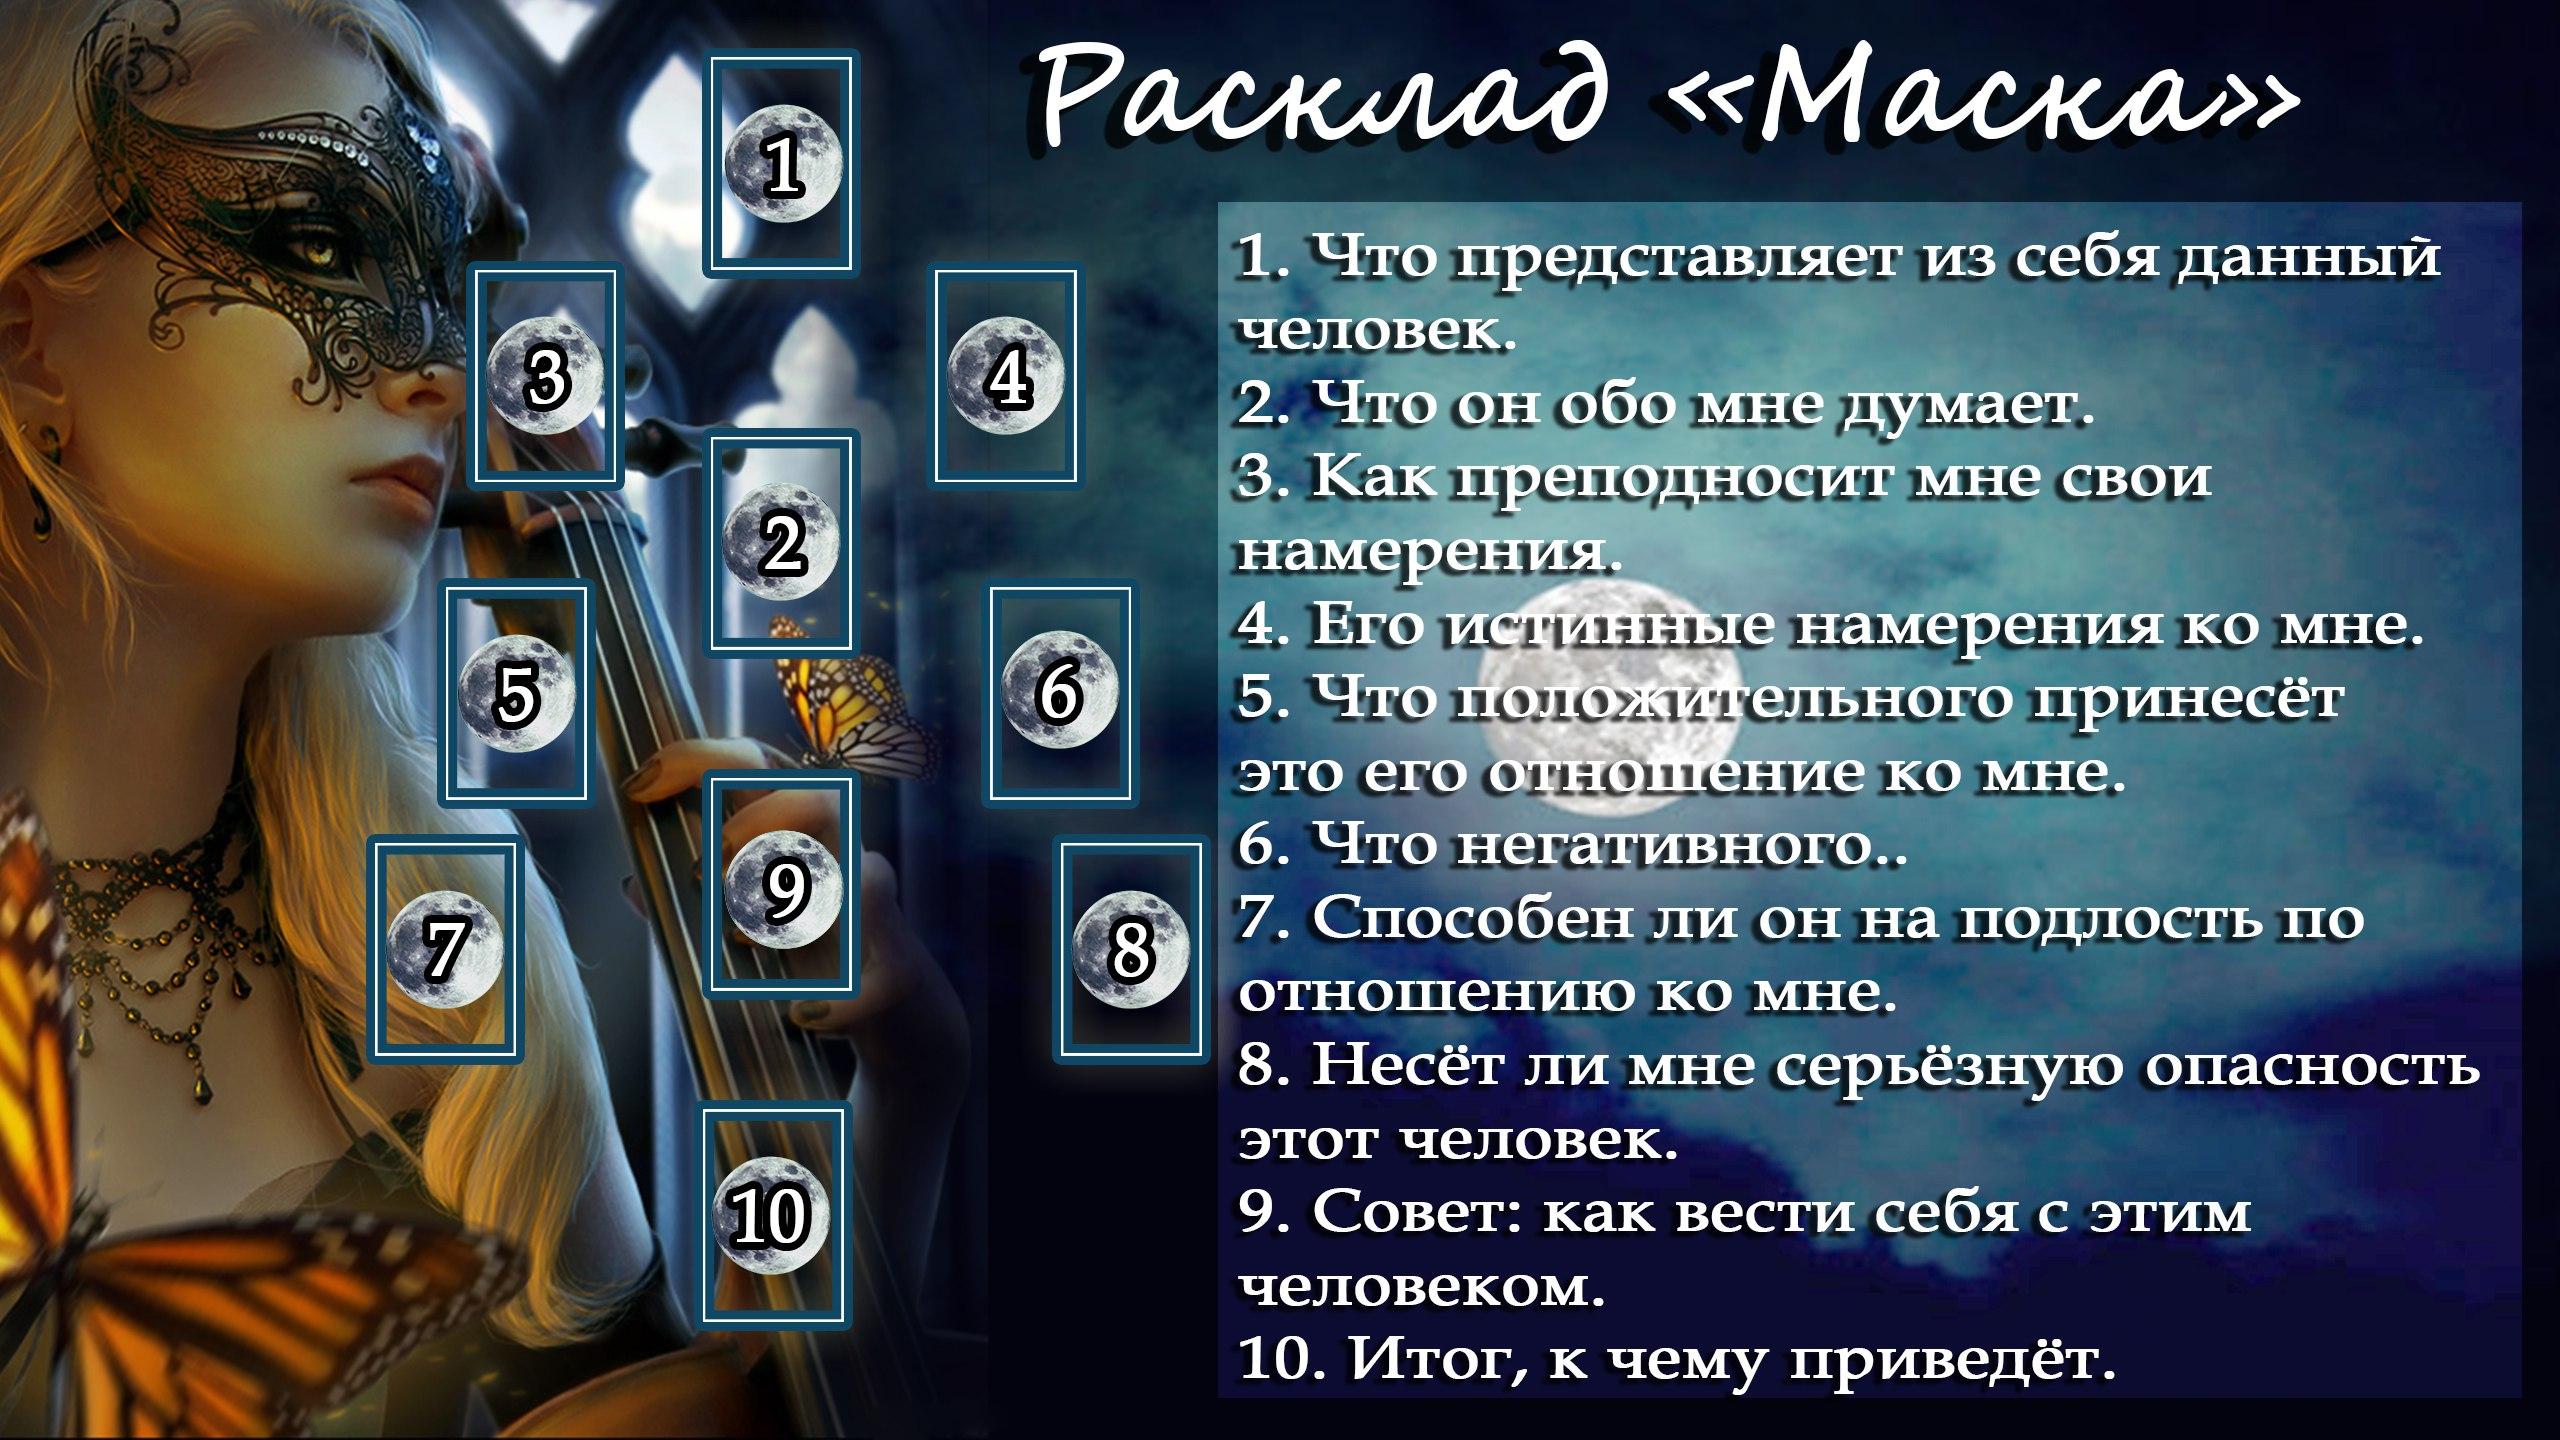 ЕленаРуденко - Расклады на картах Таро. 9u62kSgoo0k